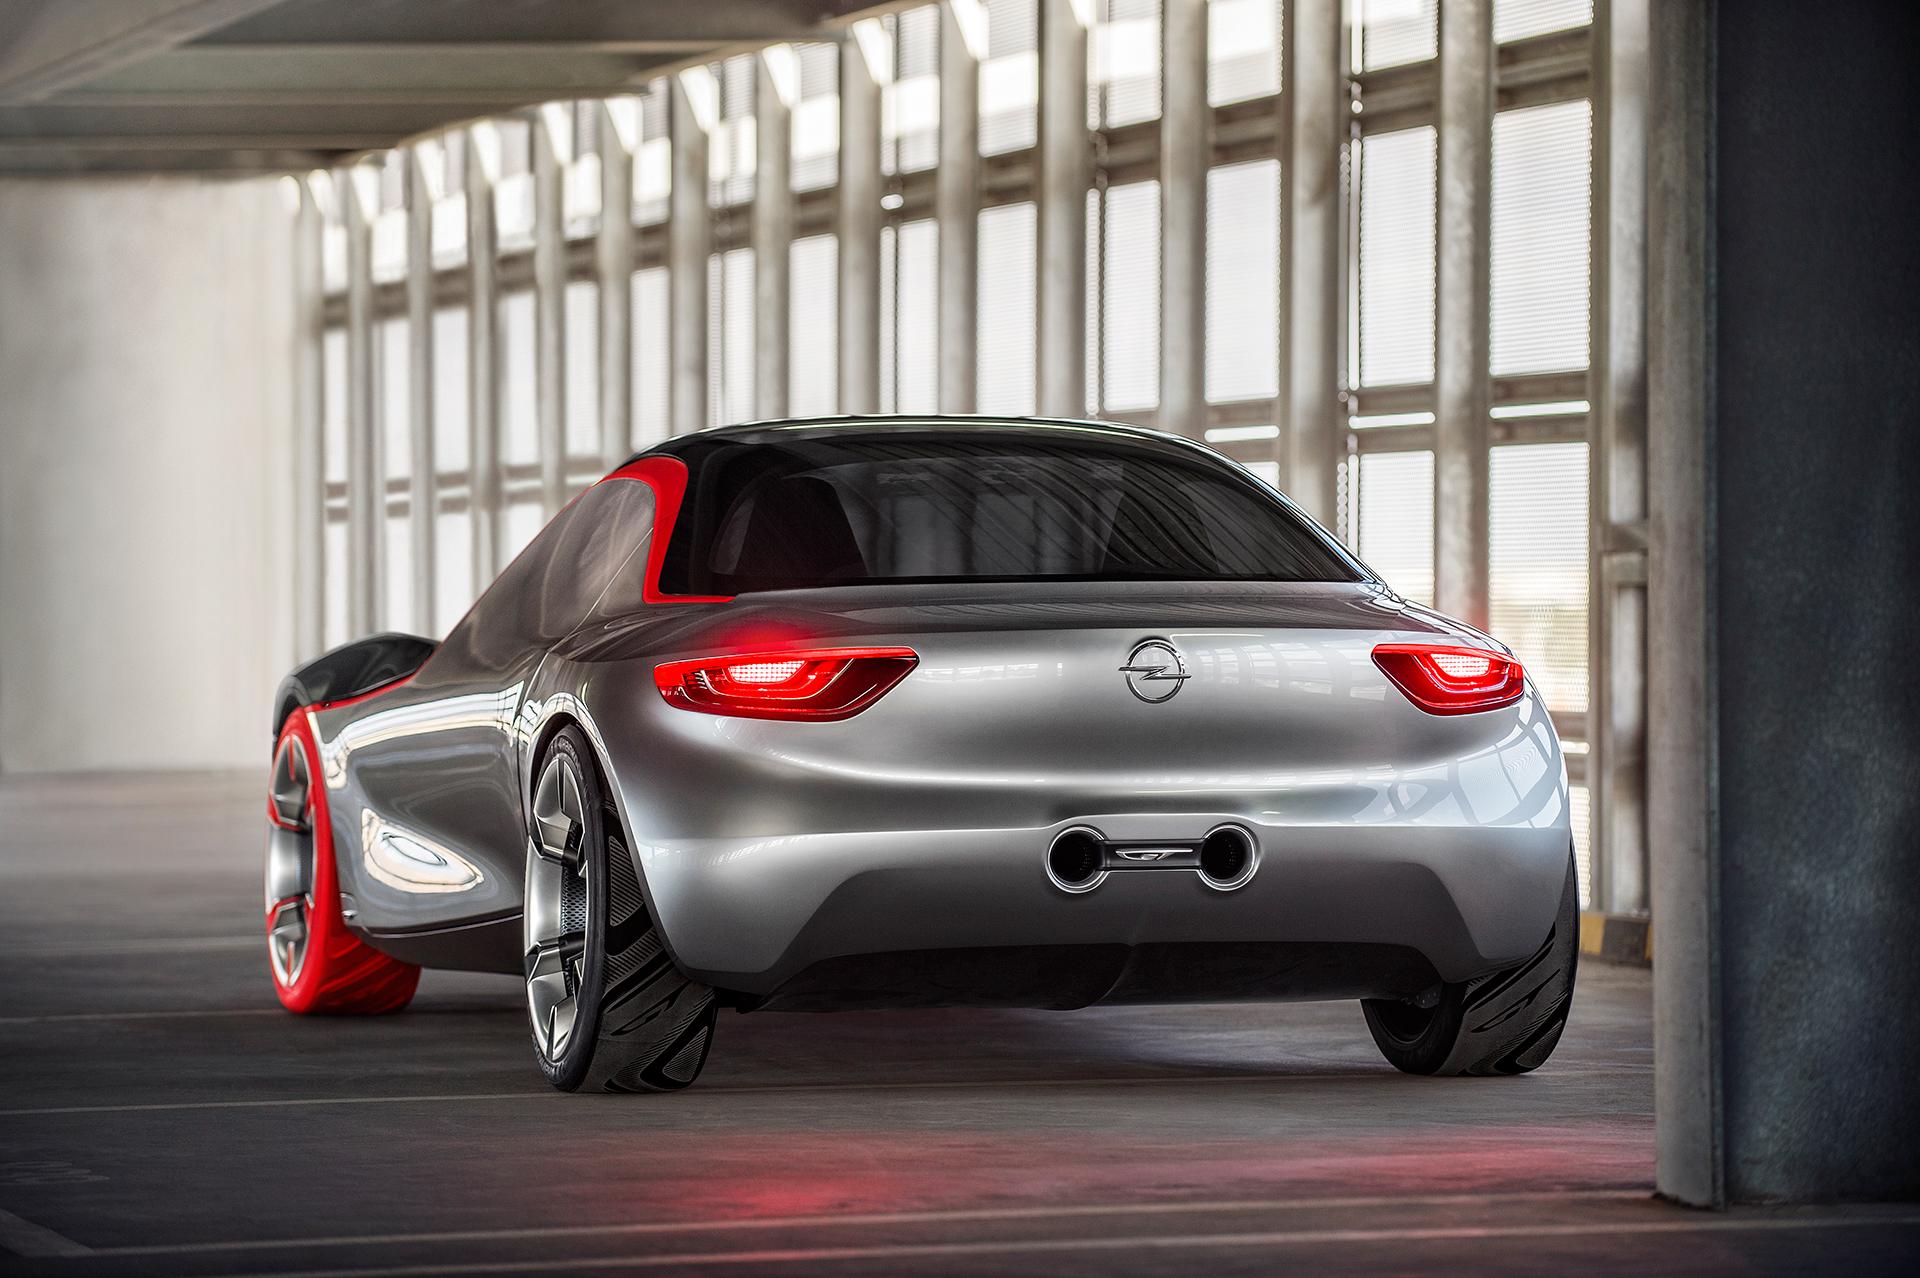 Opel GT Concept 2016 arrière / rear - Image - GM Company.